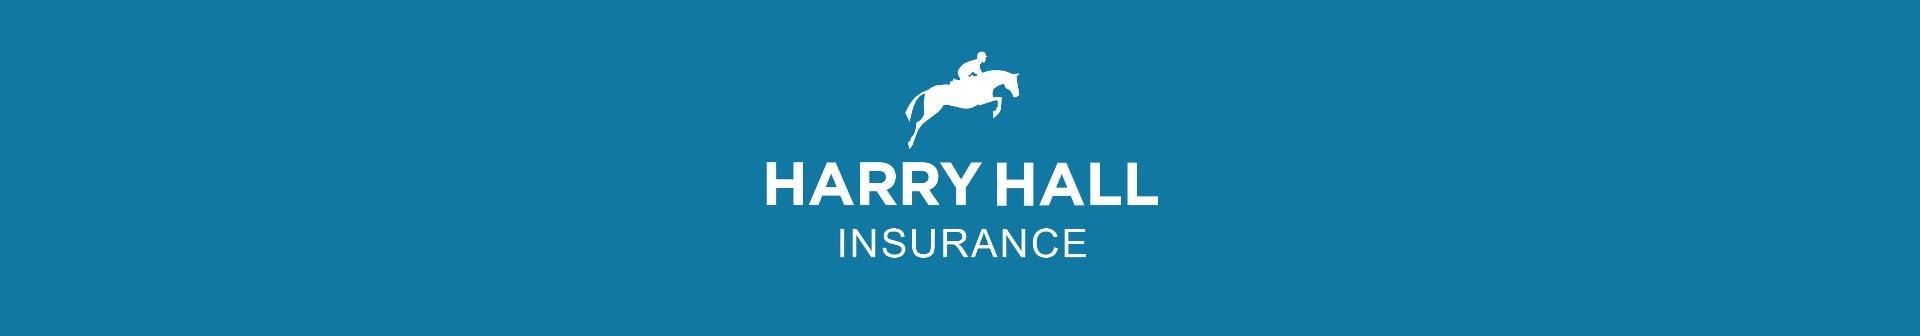 Insurance Made Easy | Harry Hall